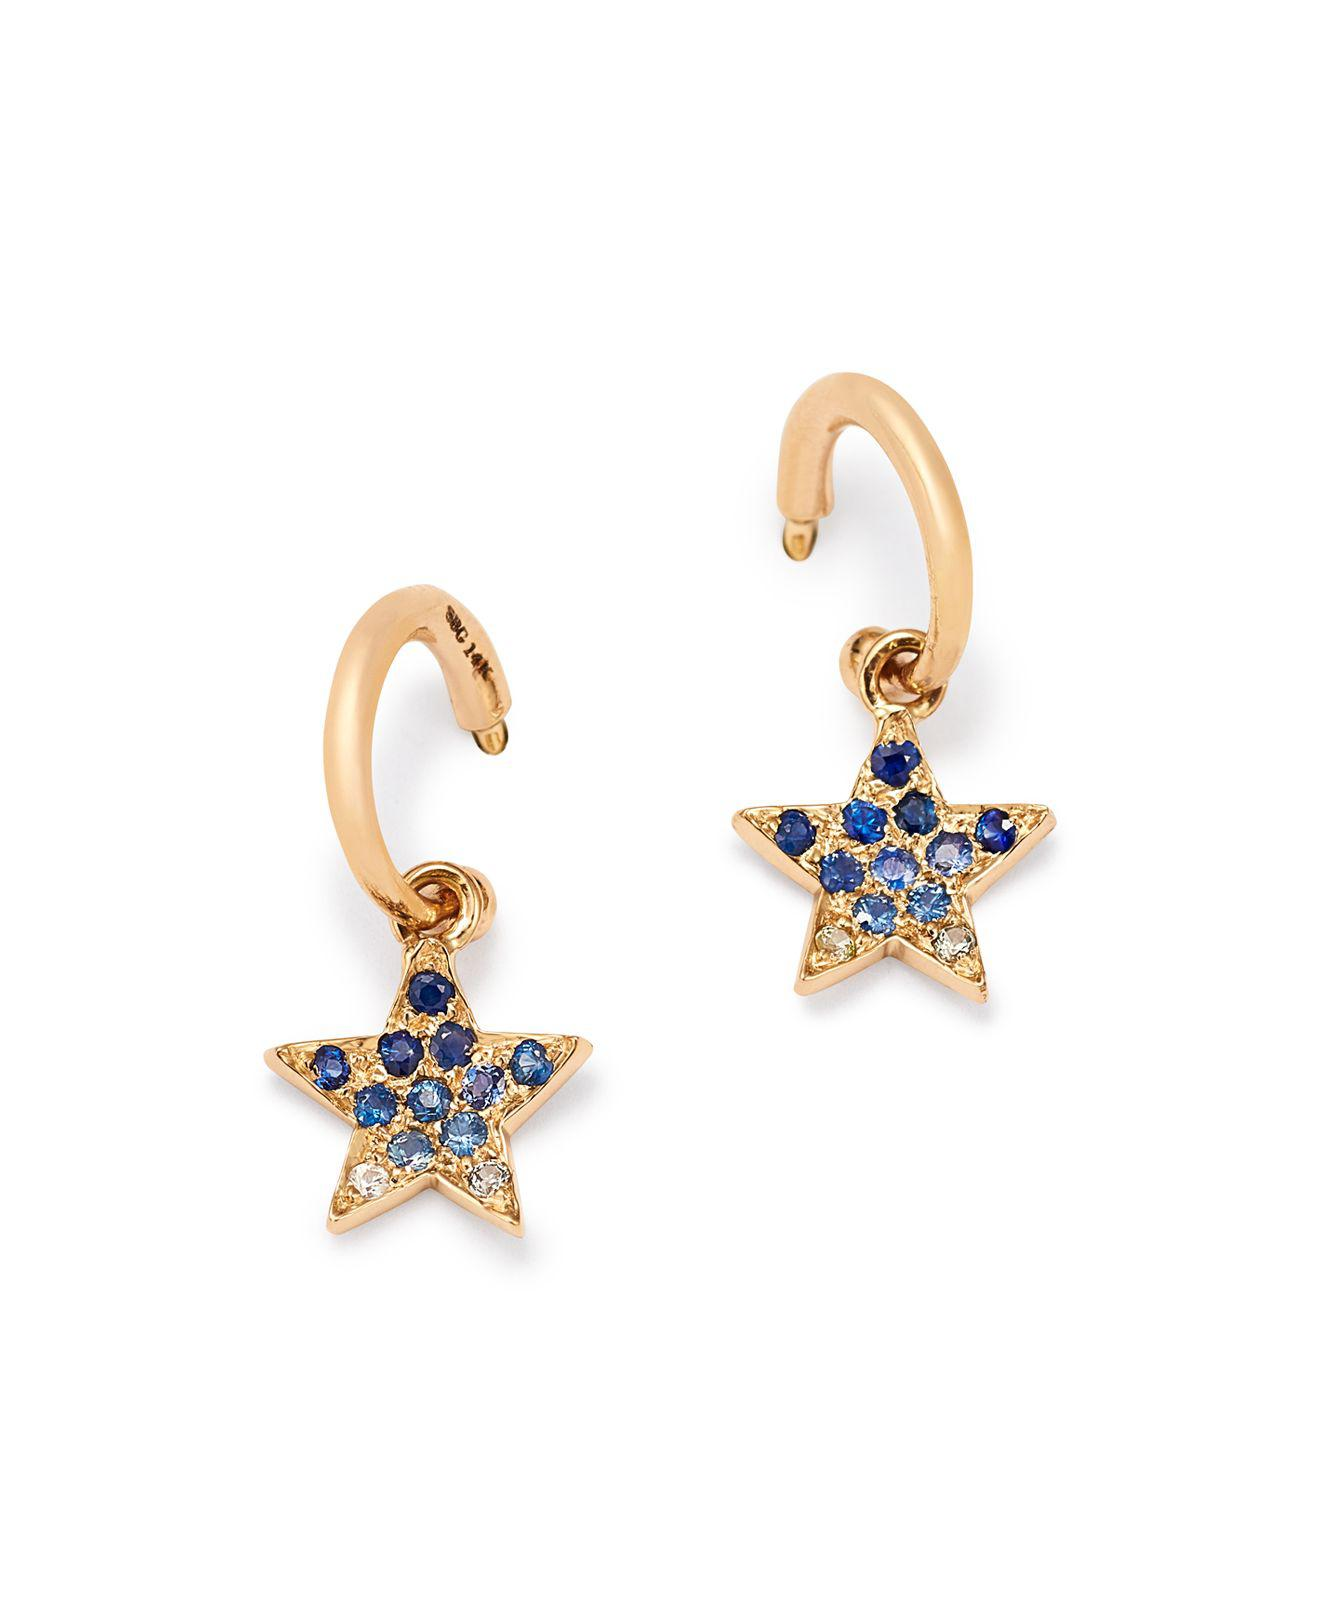 Wrap Around 14K Gold Sapphire Hoop Earrings She Bee V1qCjz